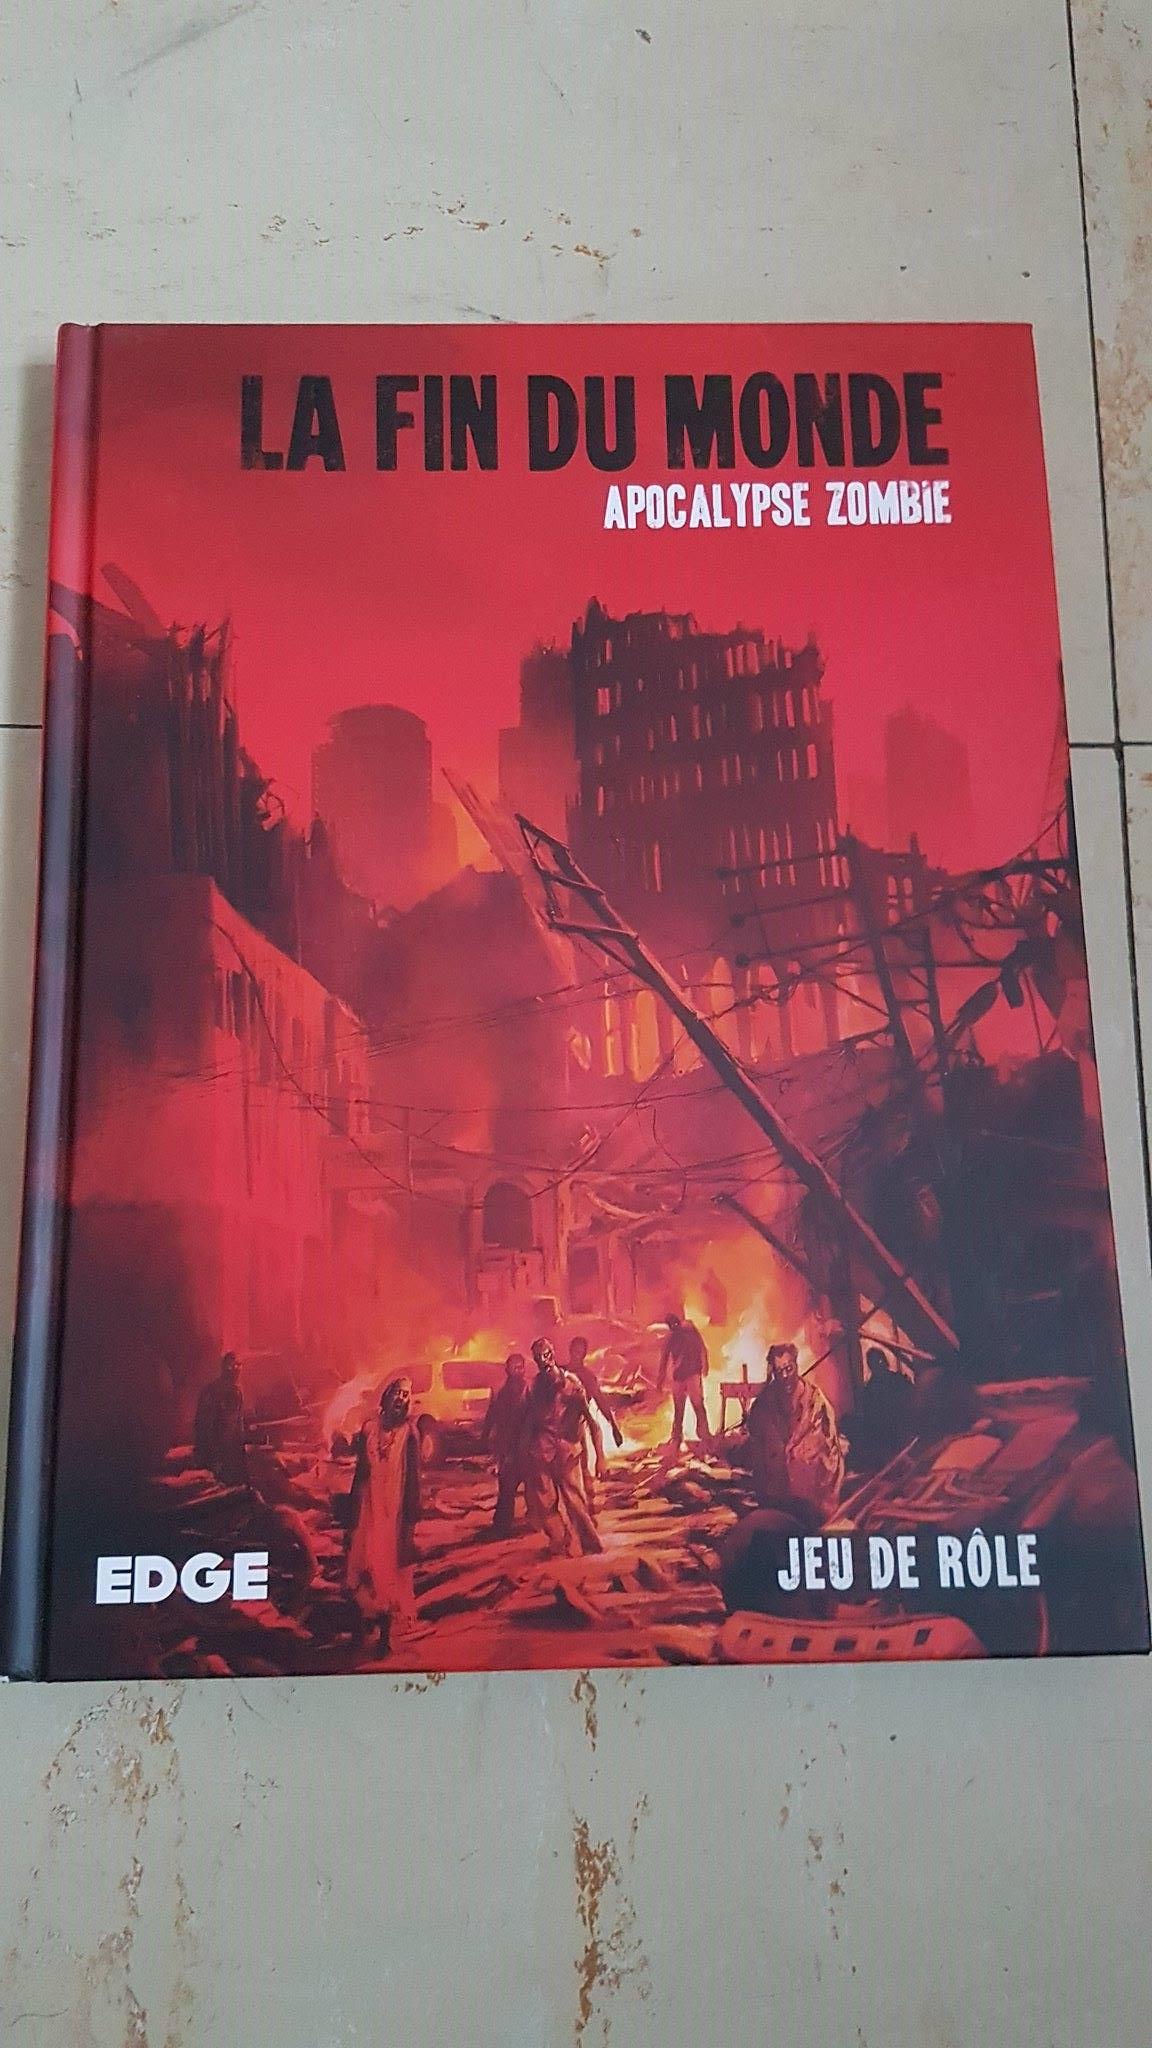 La fin du monde - Apocalypse zombi